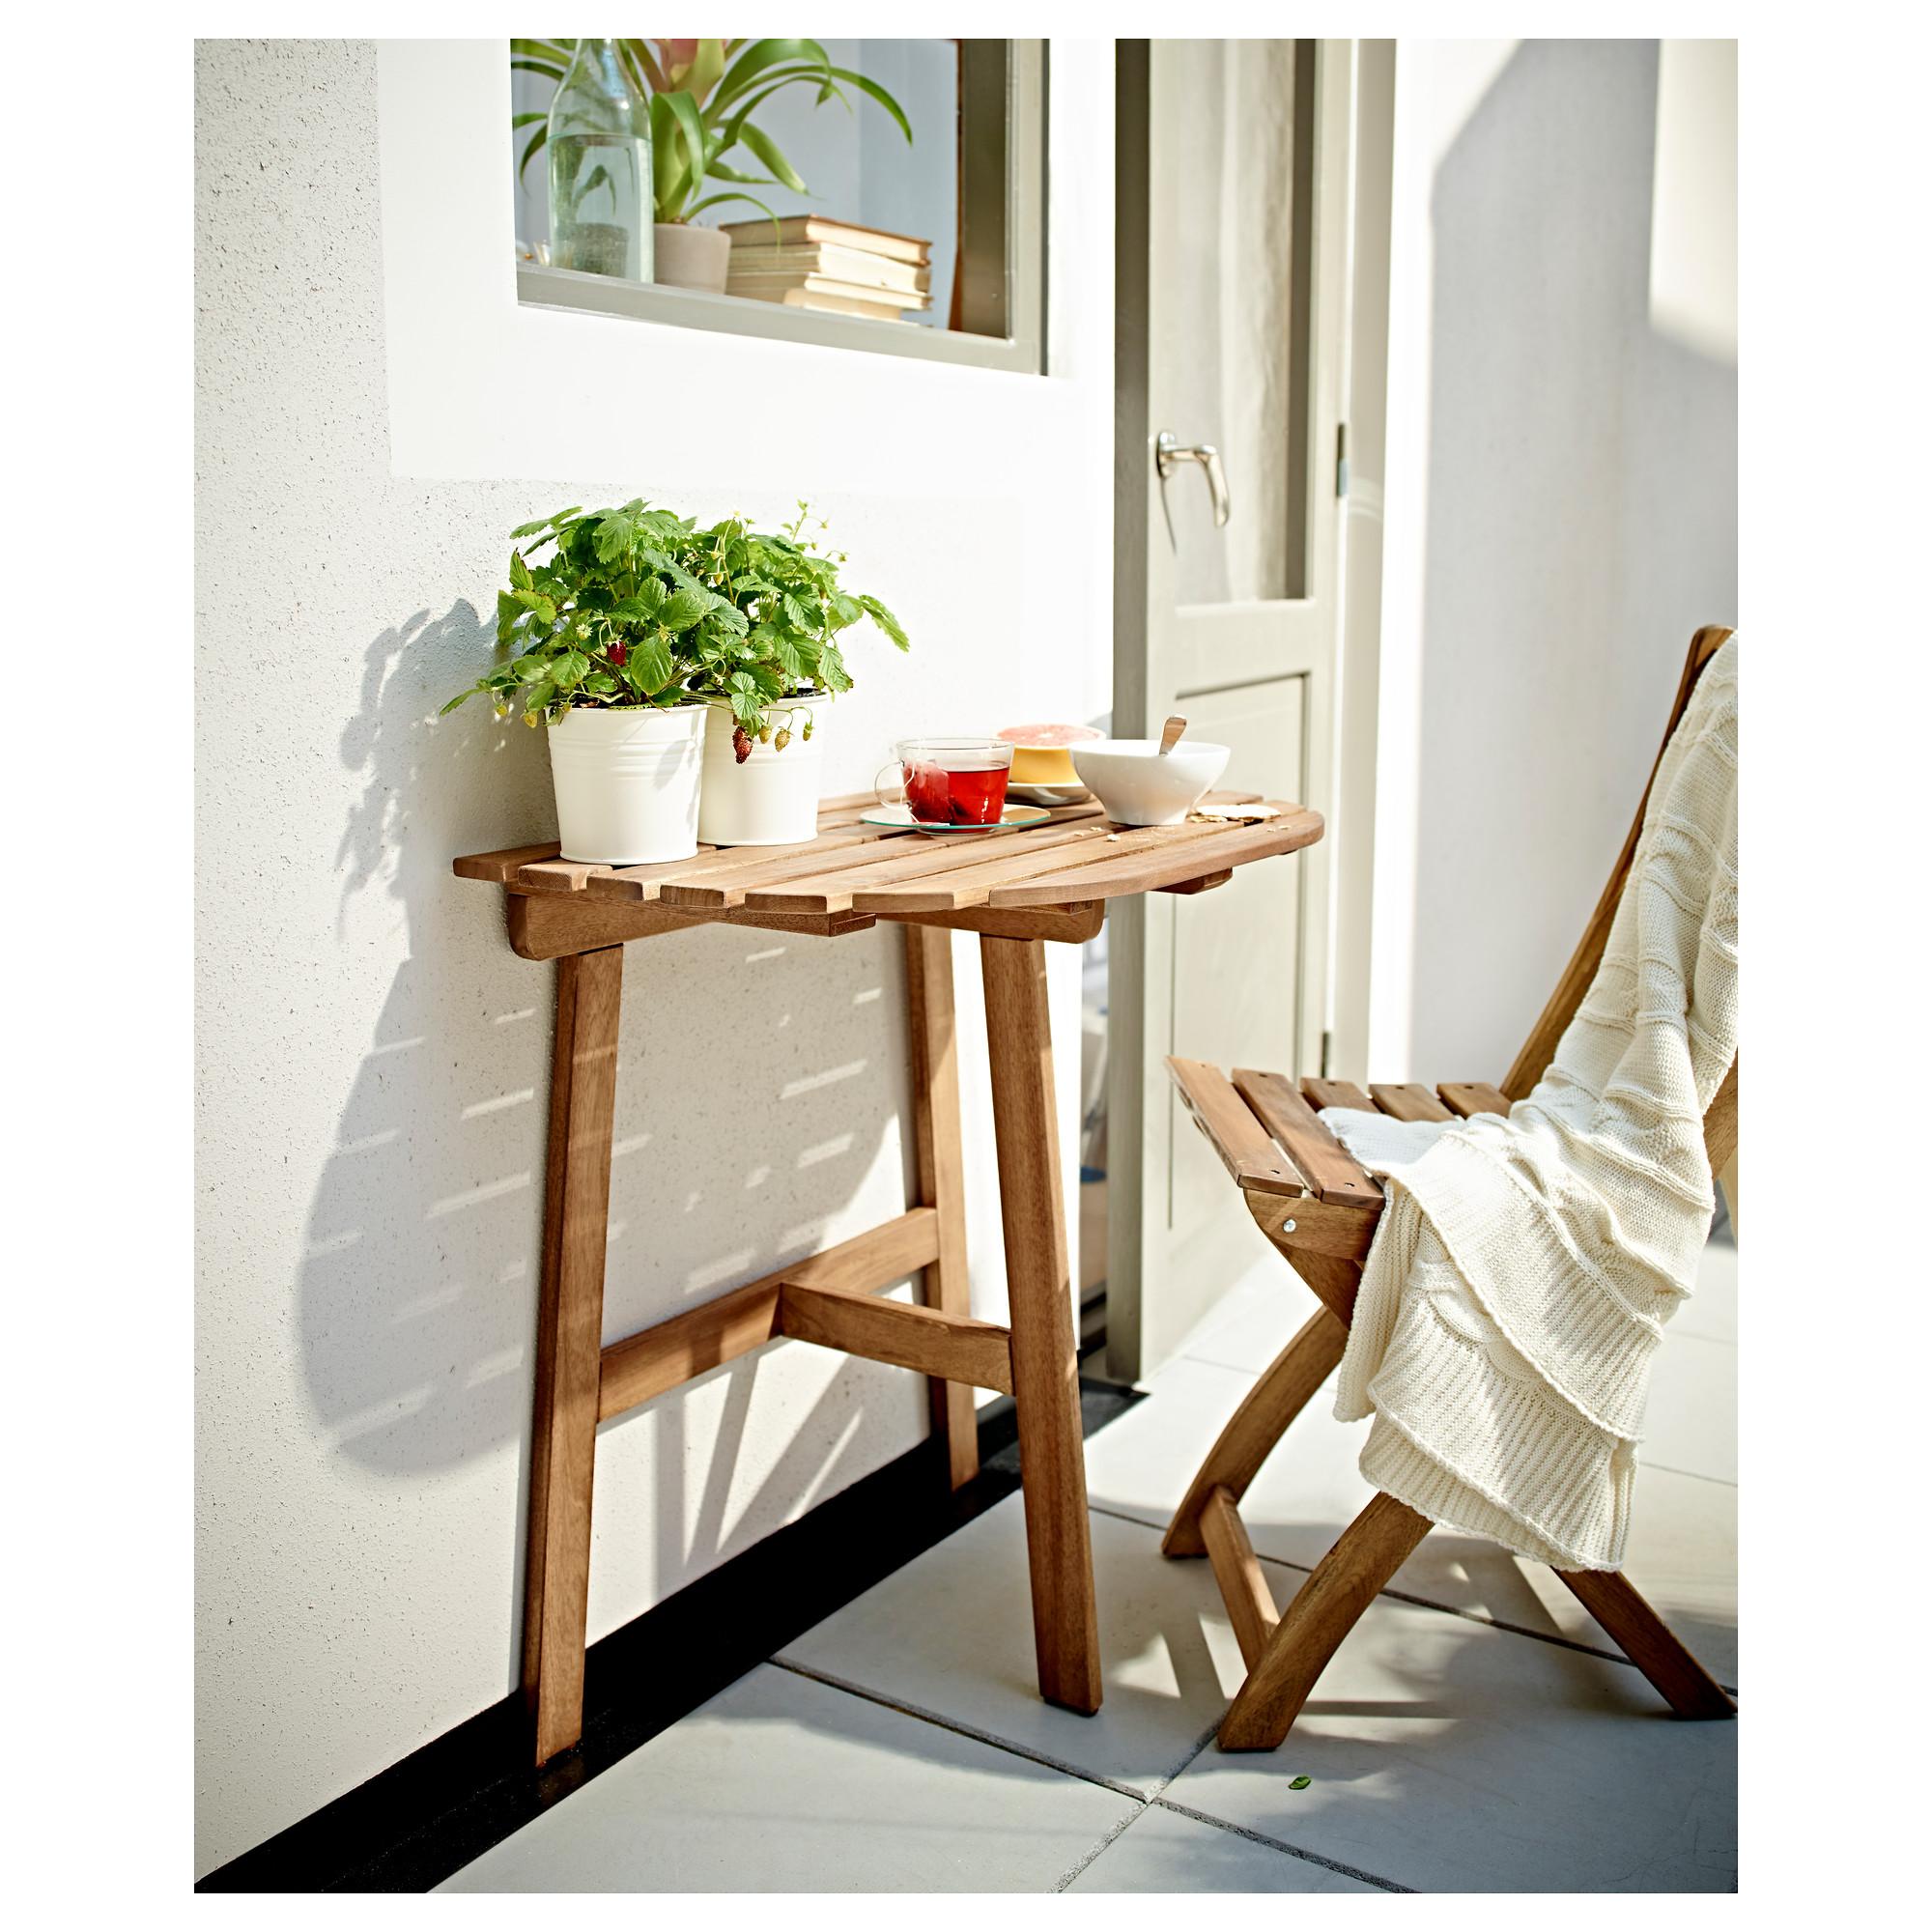 Купить балконный стол+1 складной стул аскхольмен, серый, кор.